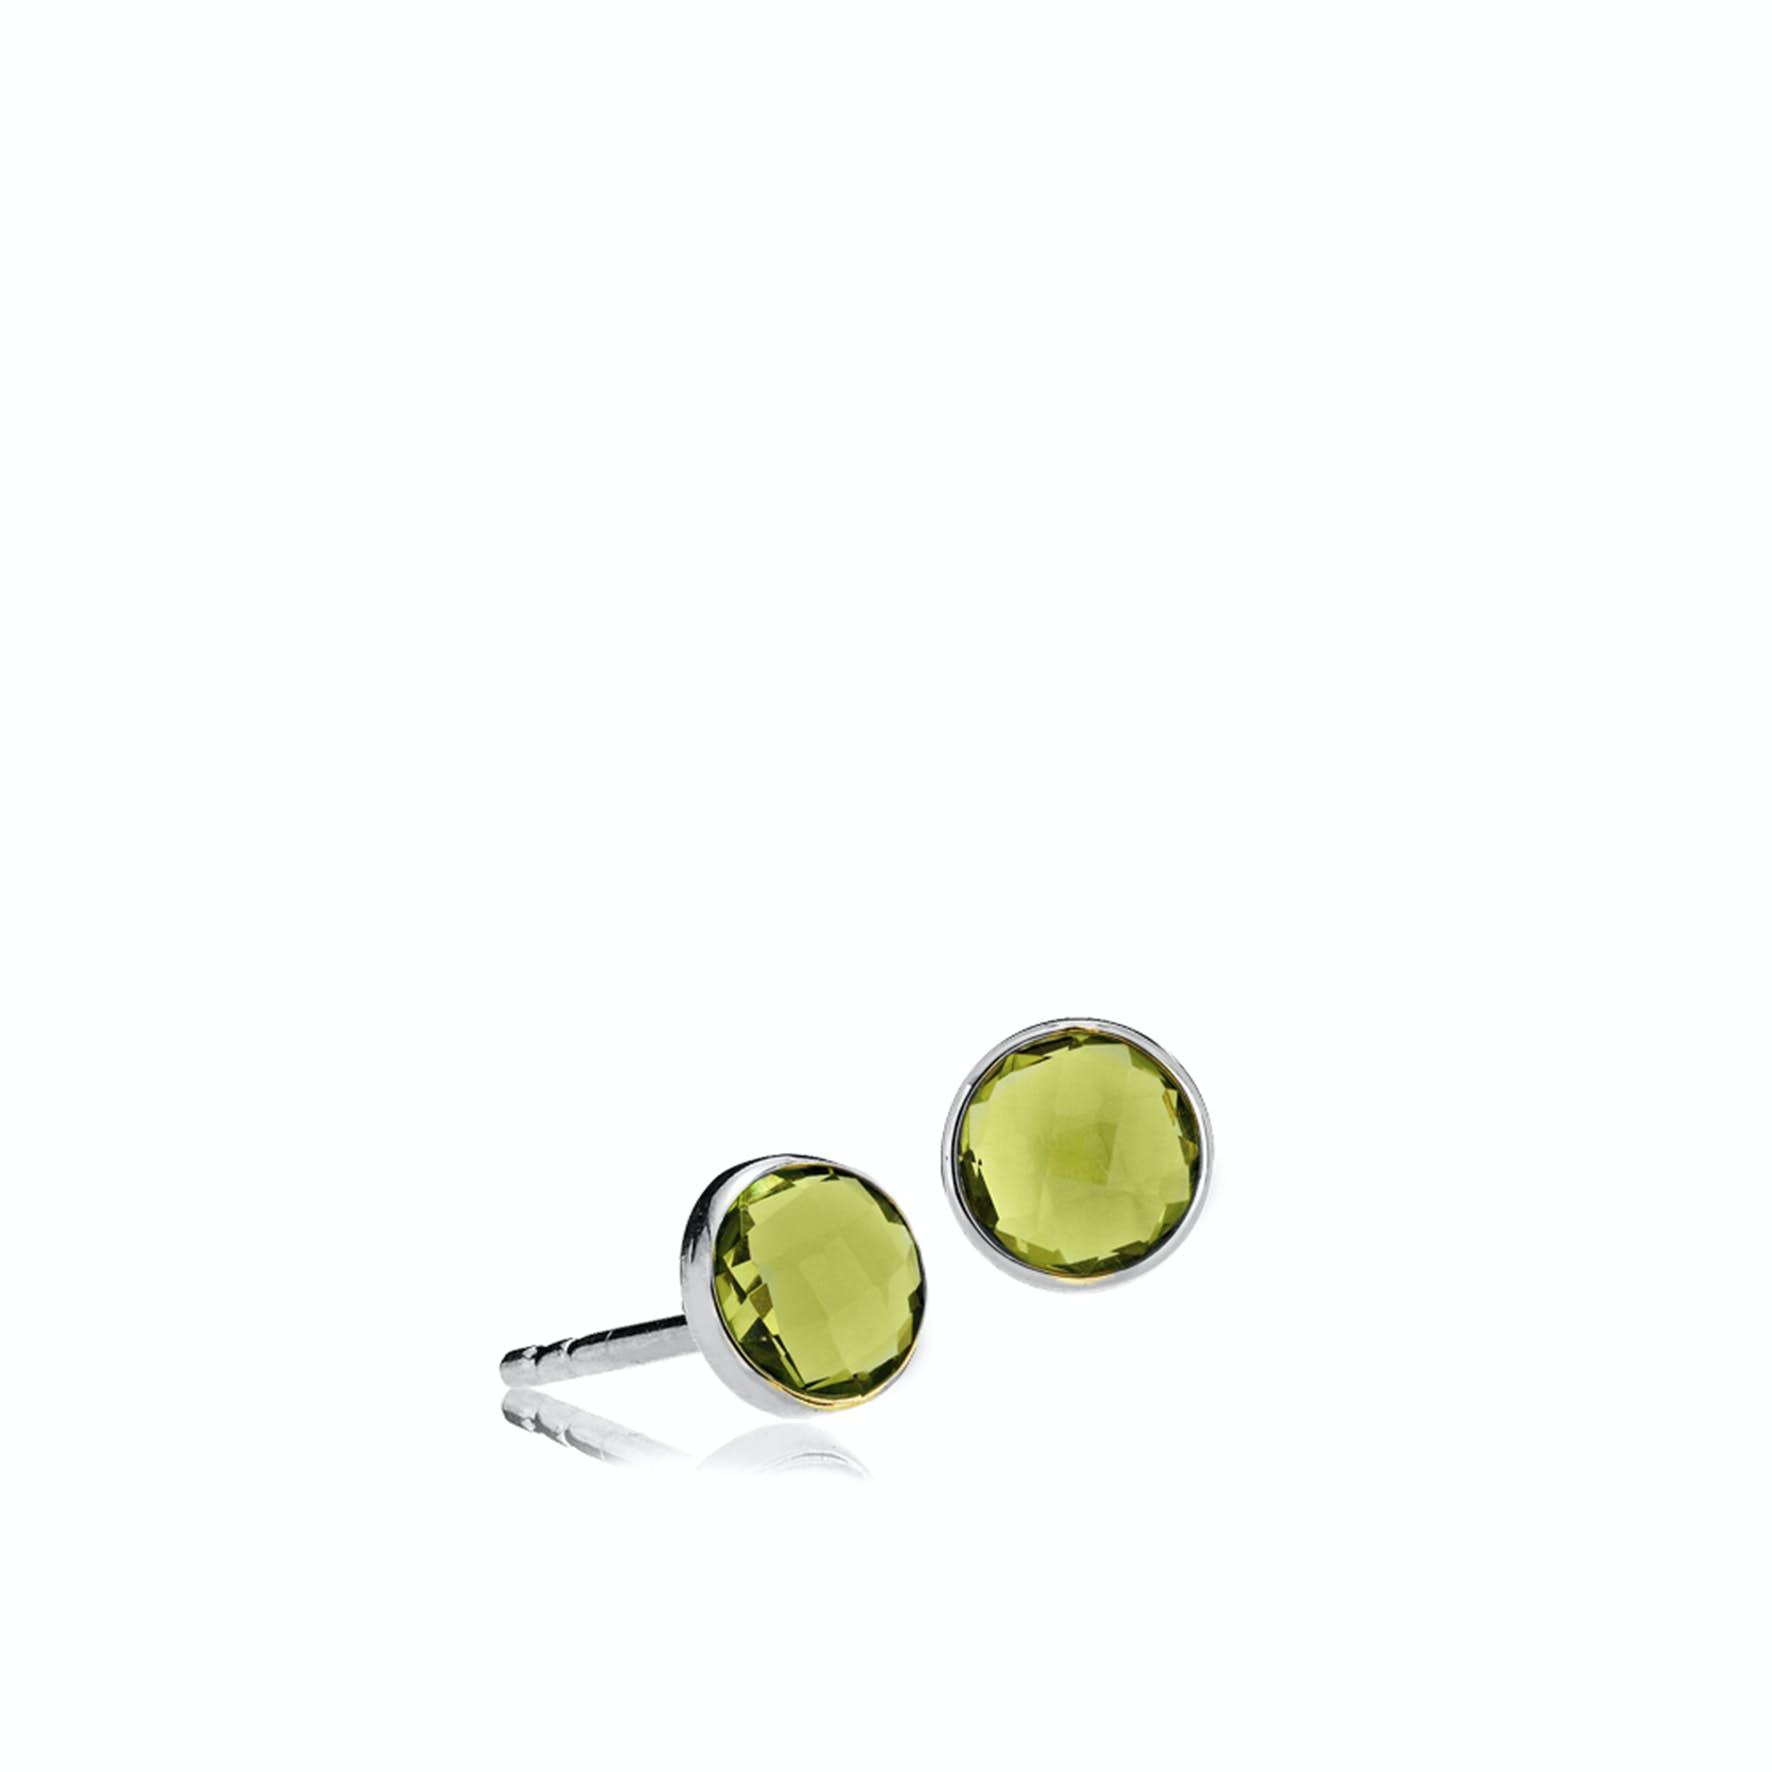 Prima donna Earsticks Peridot Green von Izabel Camille in Silber Sterling 925 Peridot Green